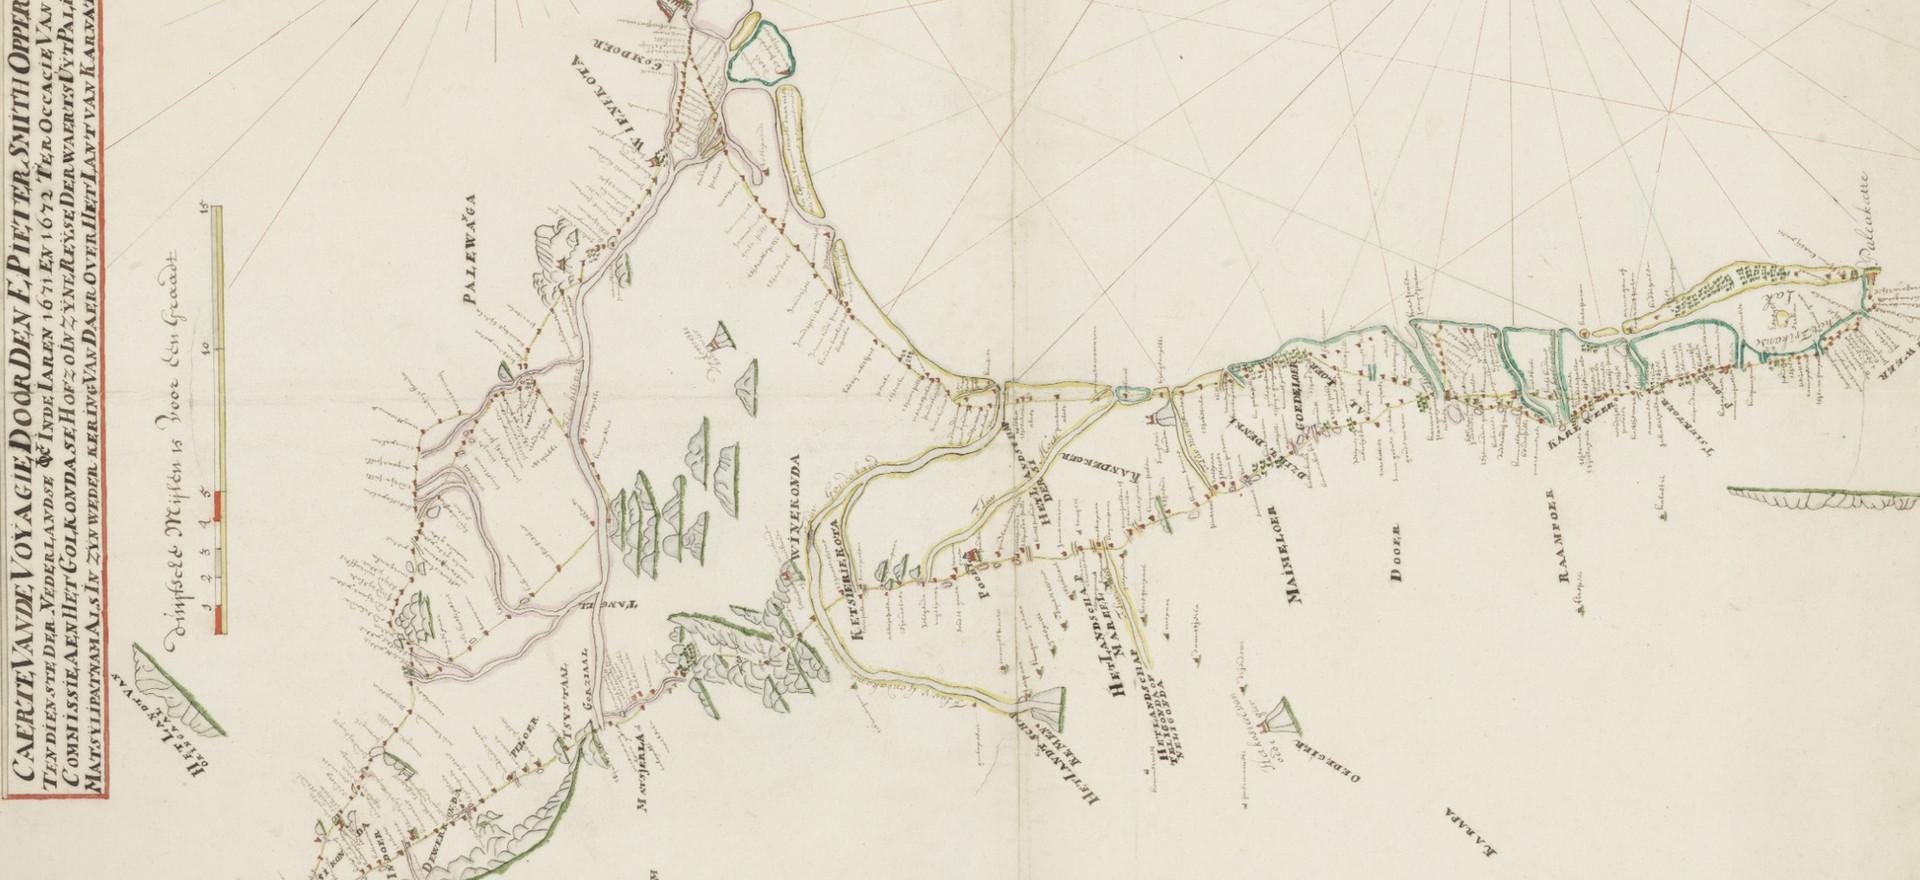 1671AD - Pulicat to Golkonda